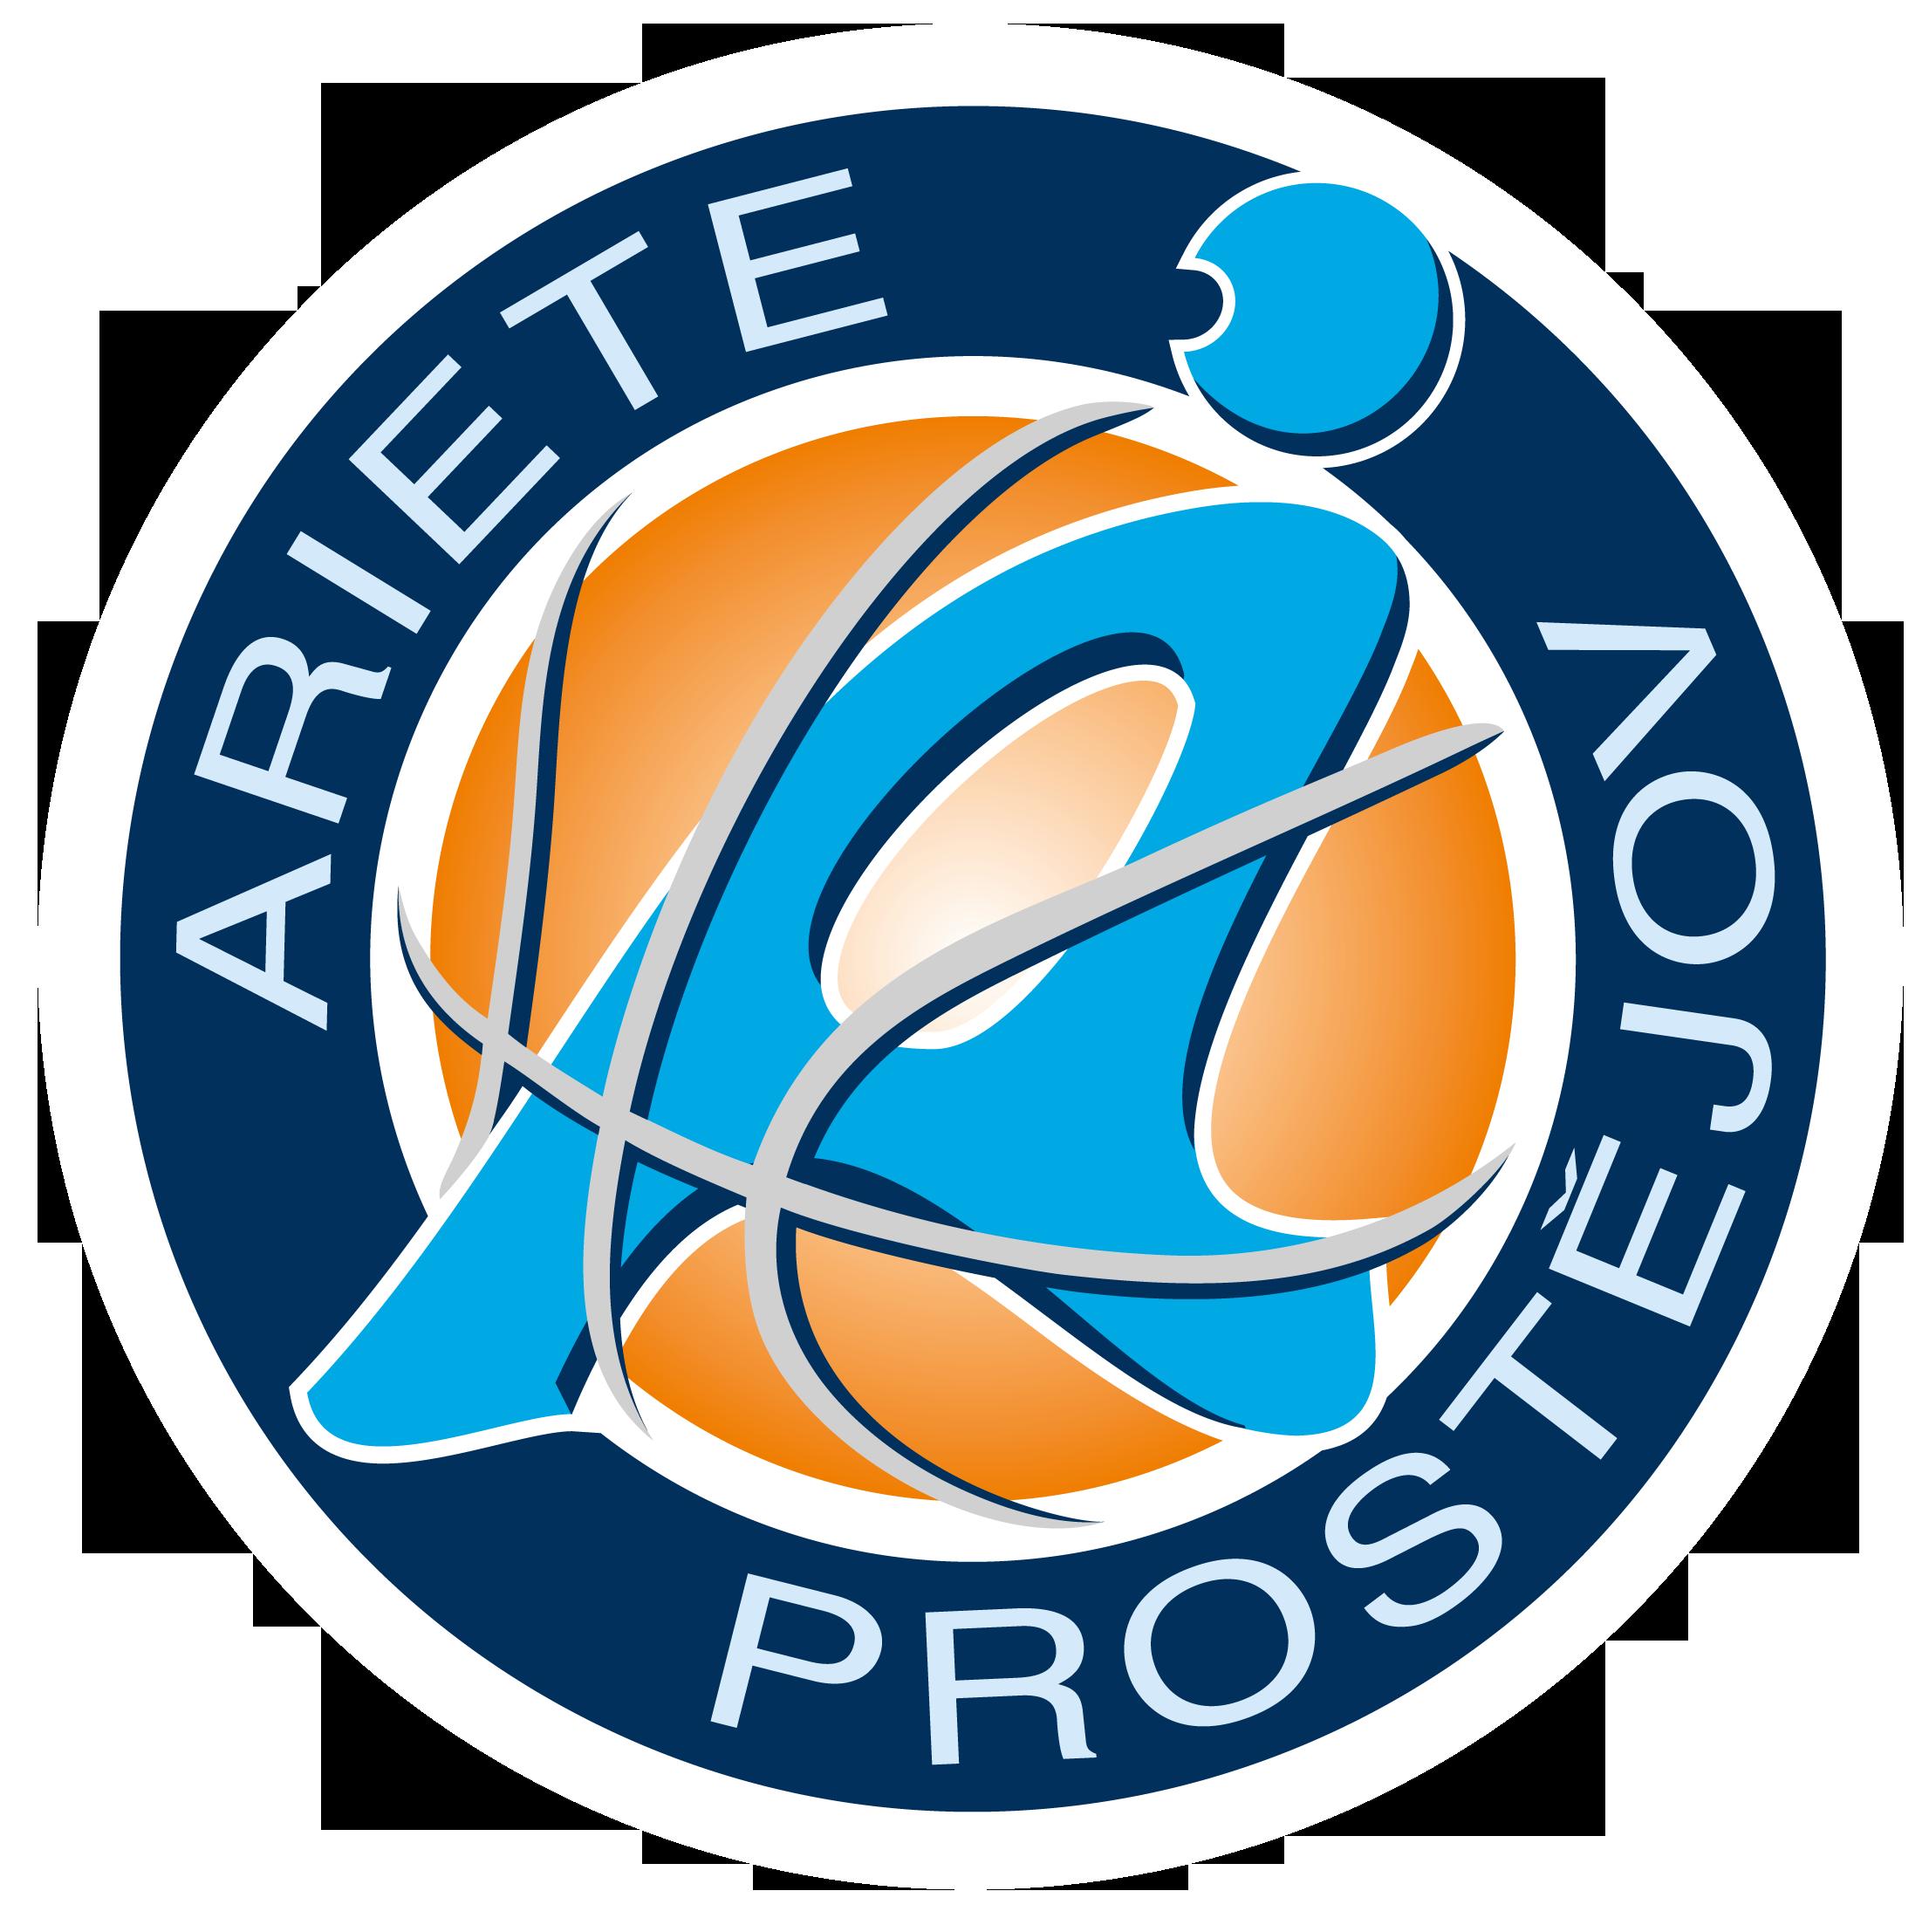 Ariete Prost�jov